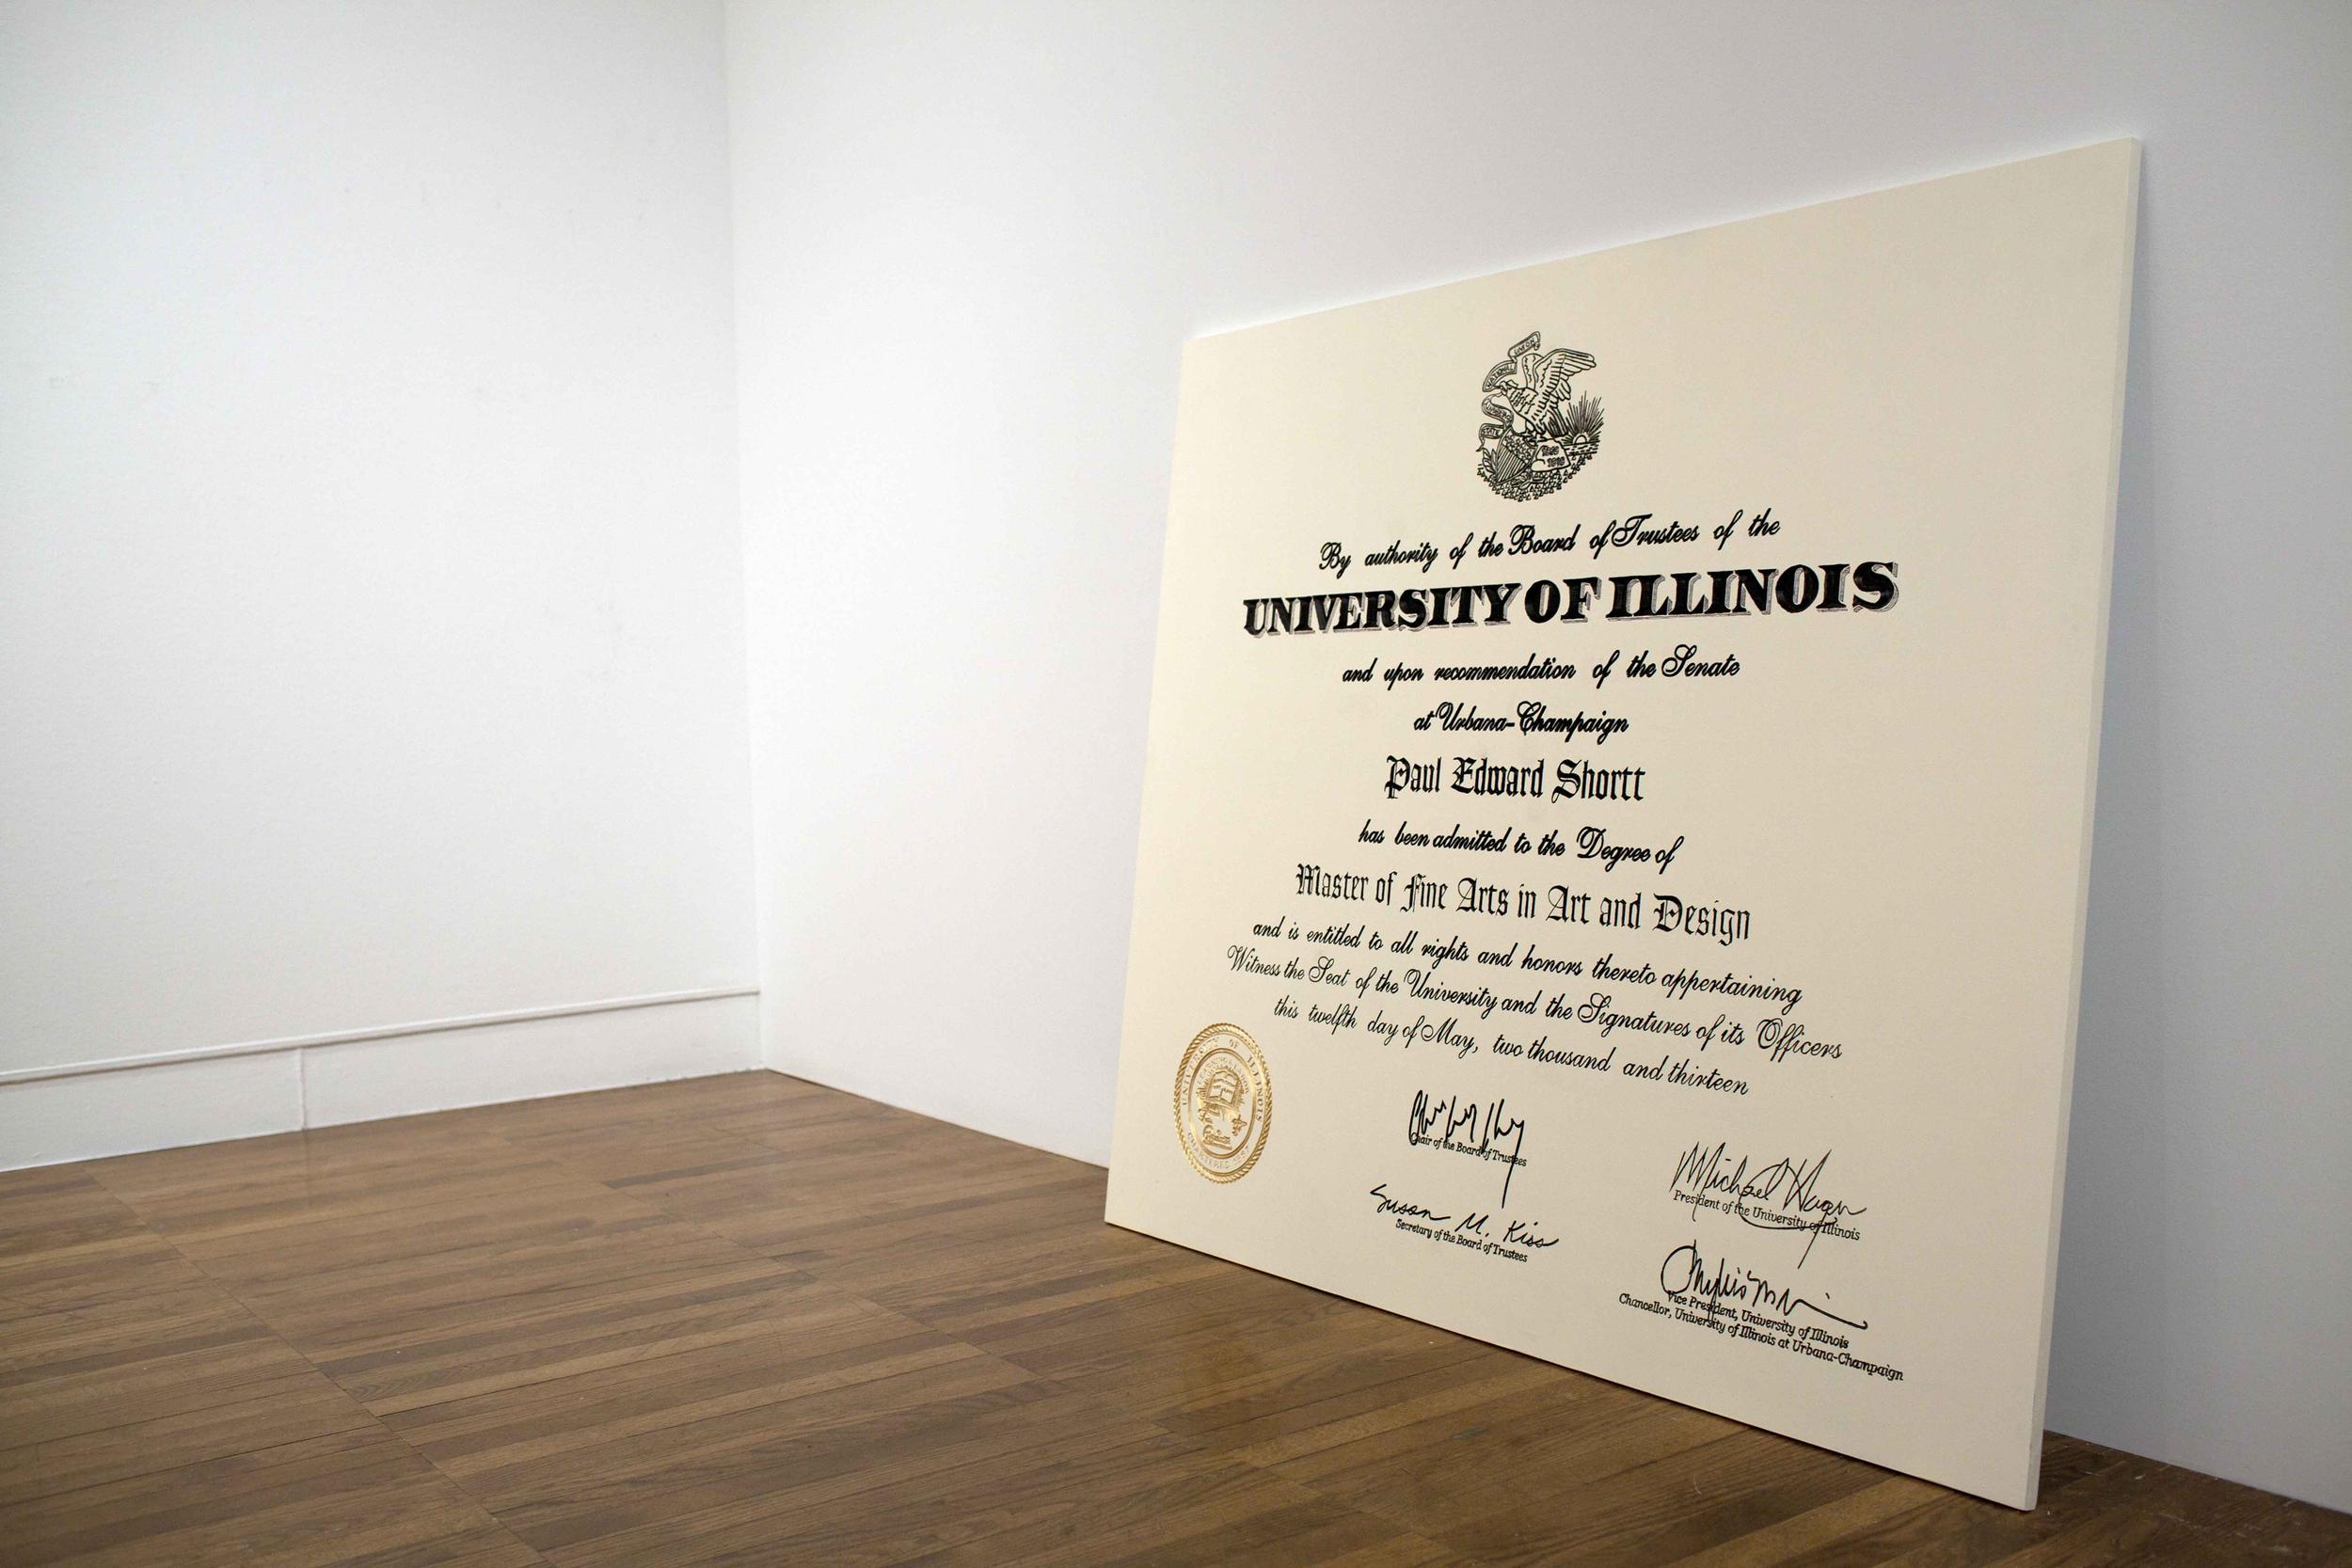 PaulShortt_Diploma